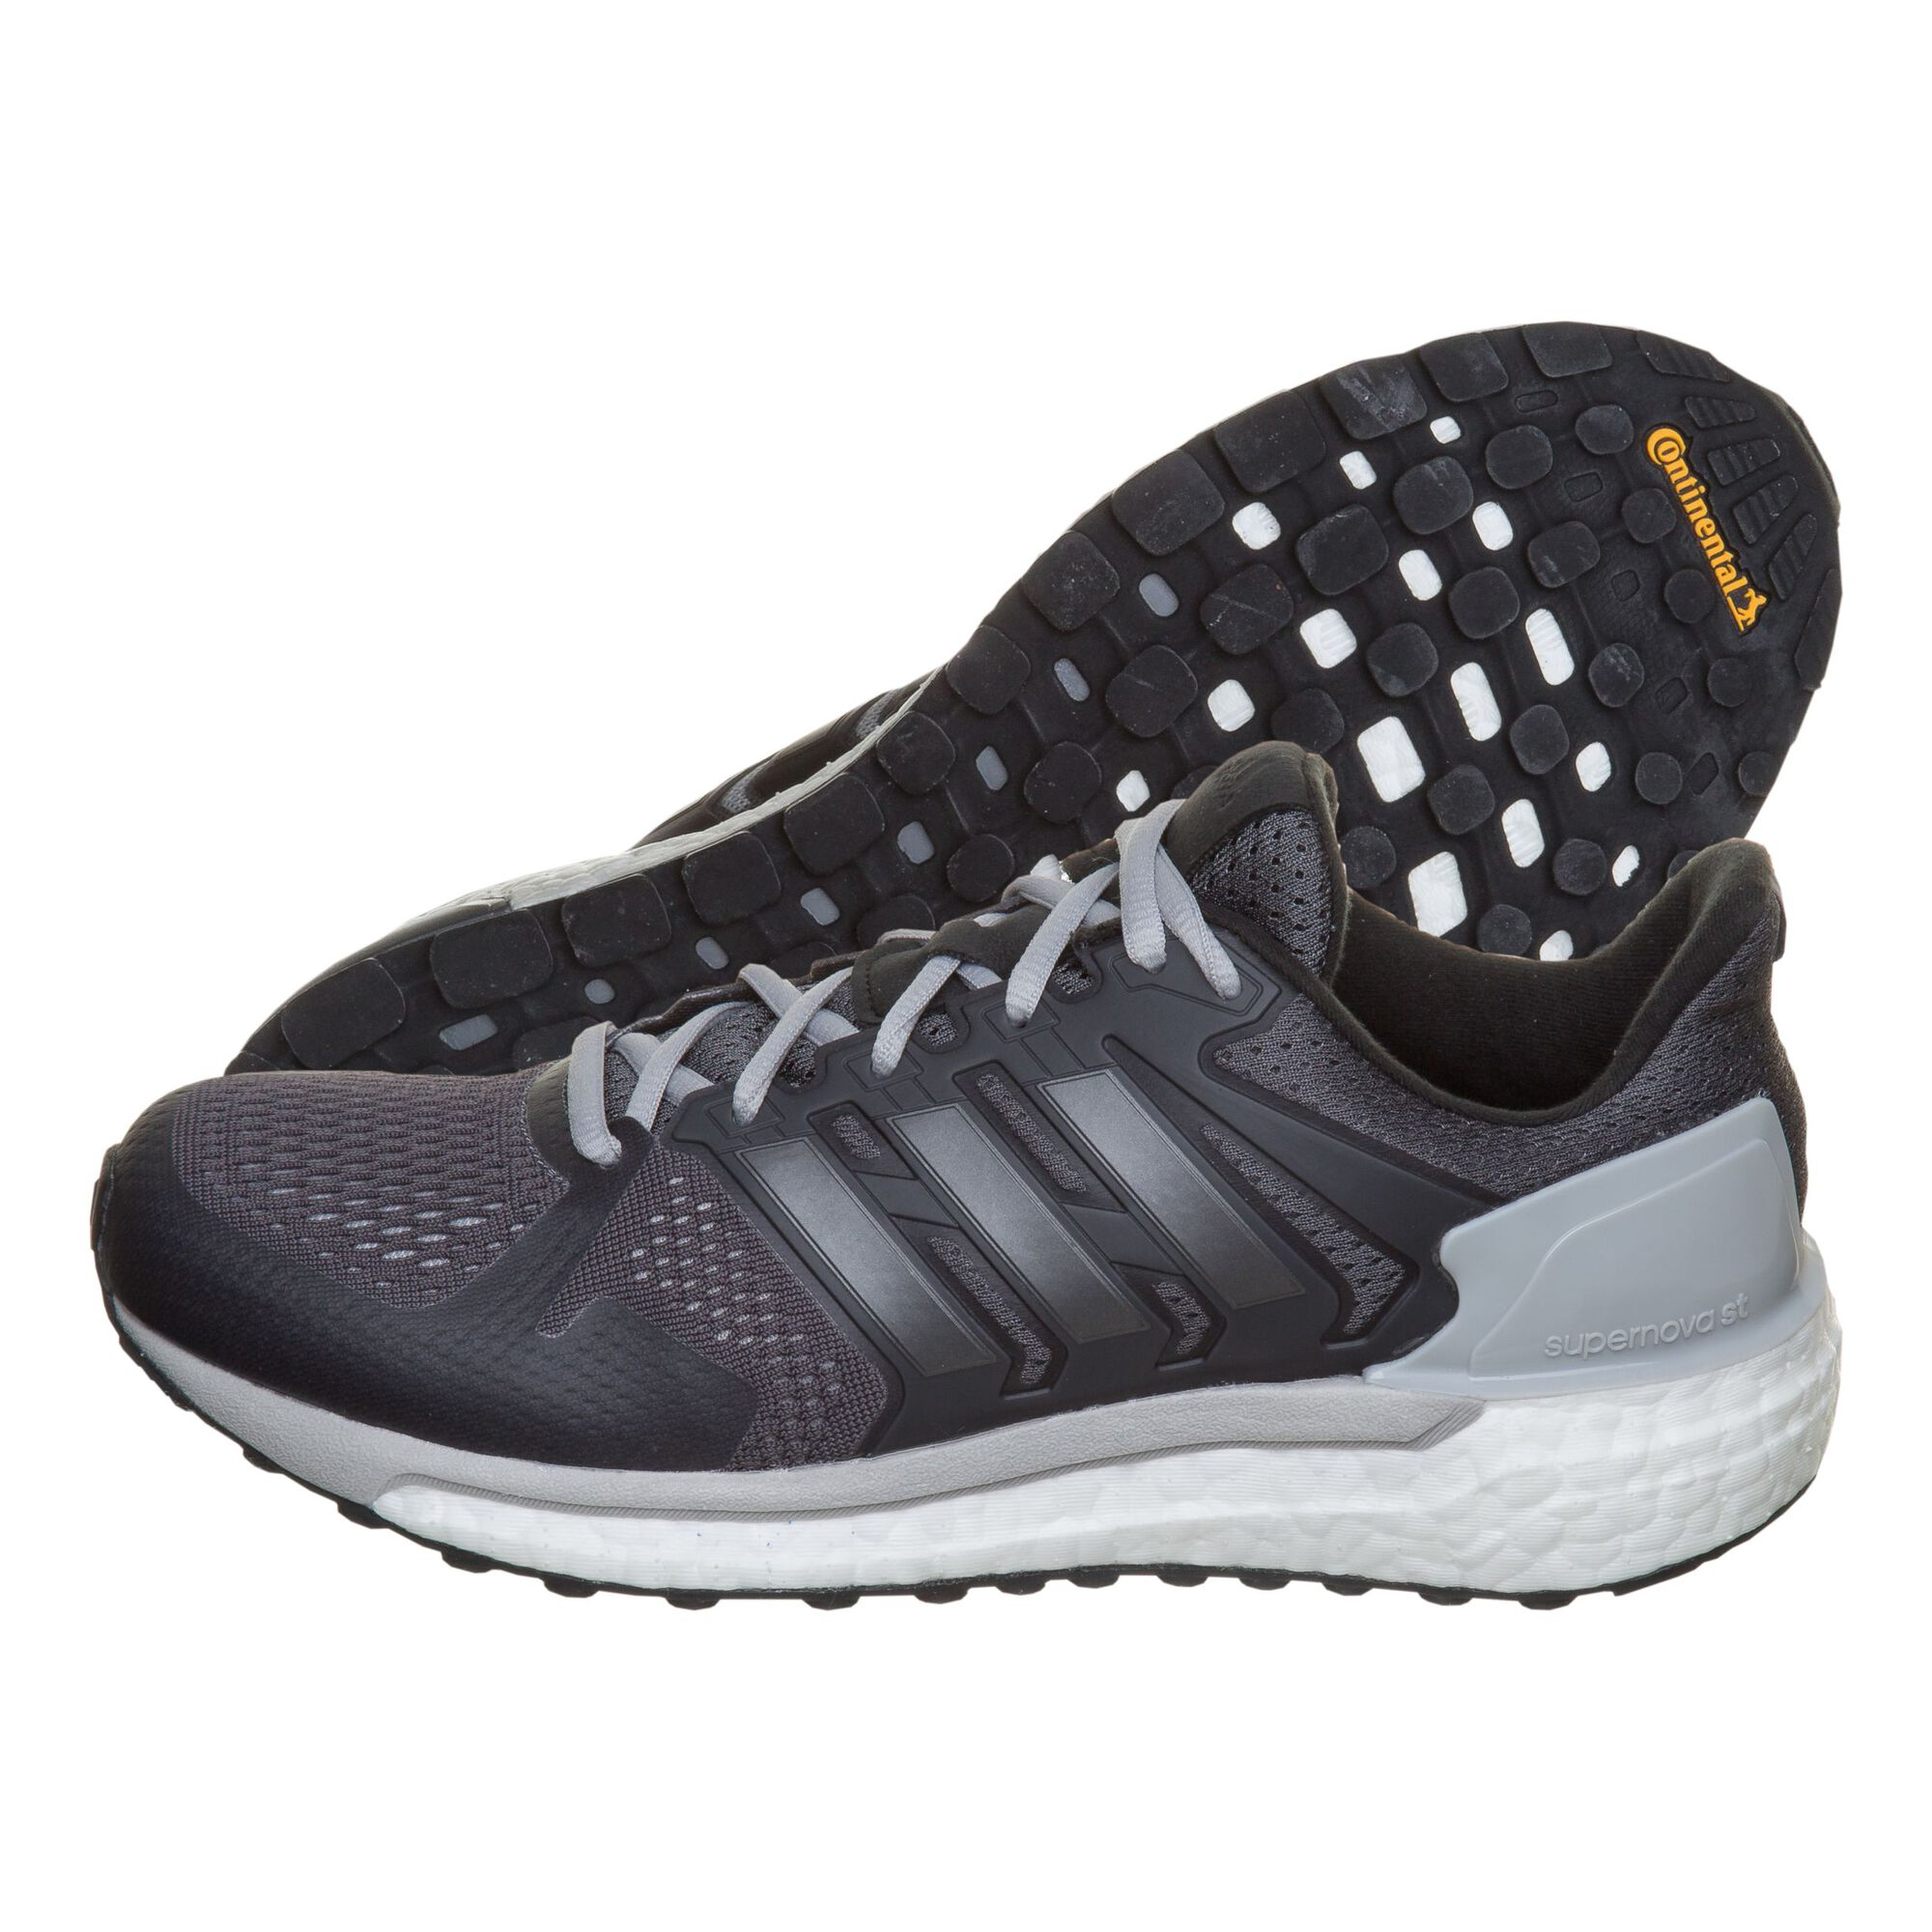 d62b444c72a9f buy adidas Supernova ST Stability Running Shoe Women - Black